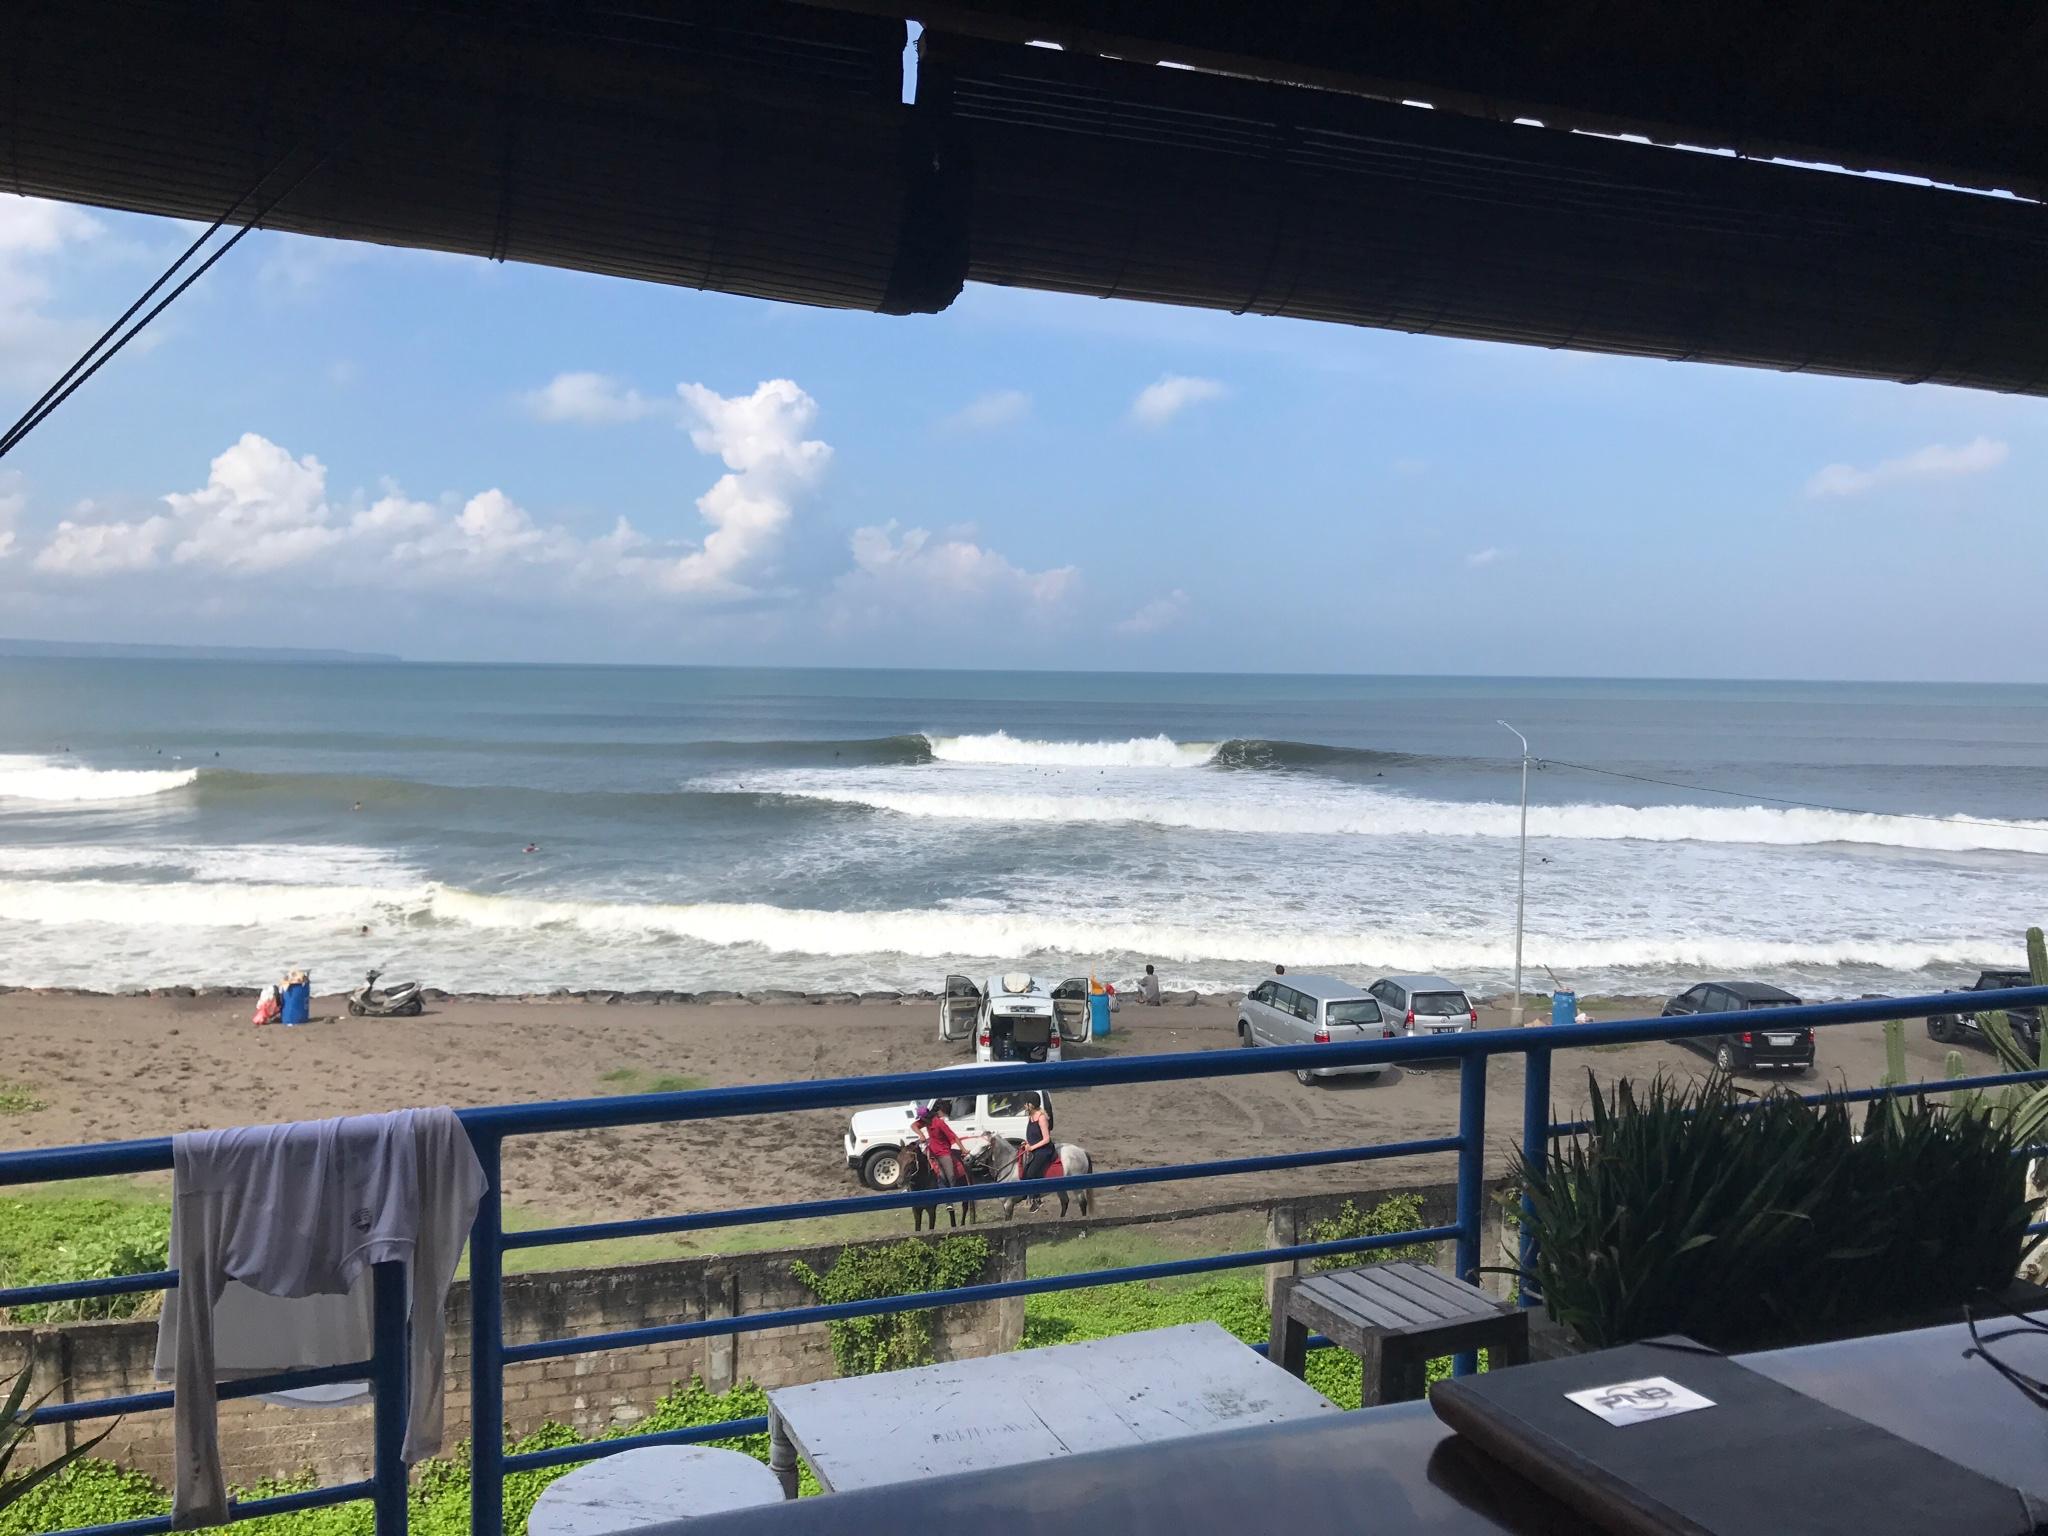 Waves at Echo Beach